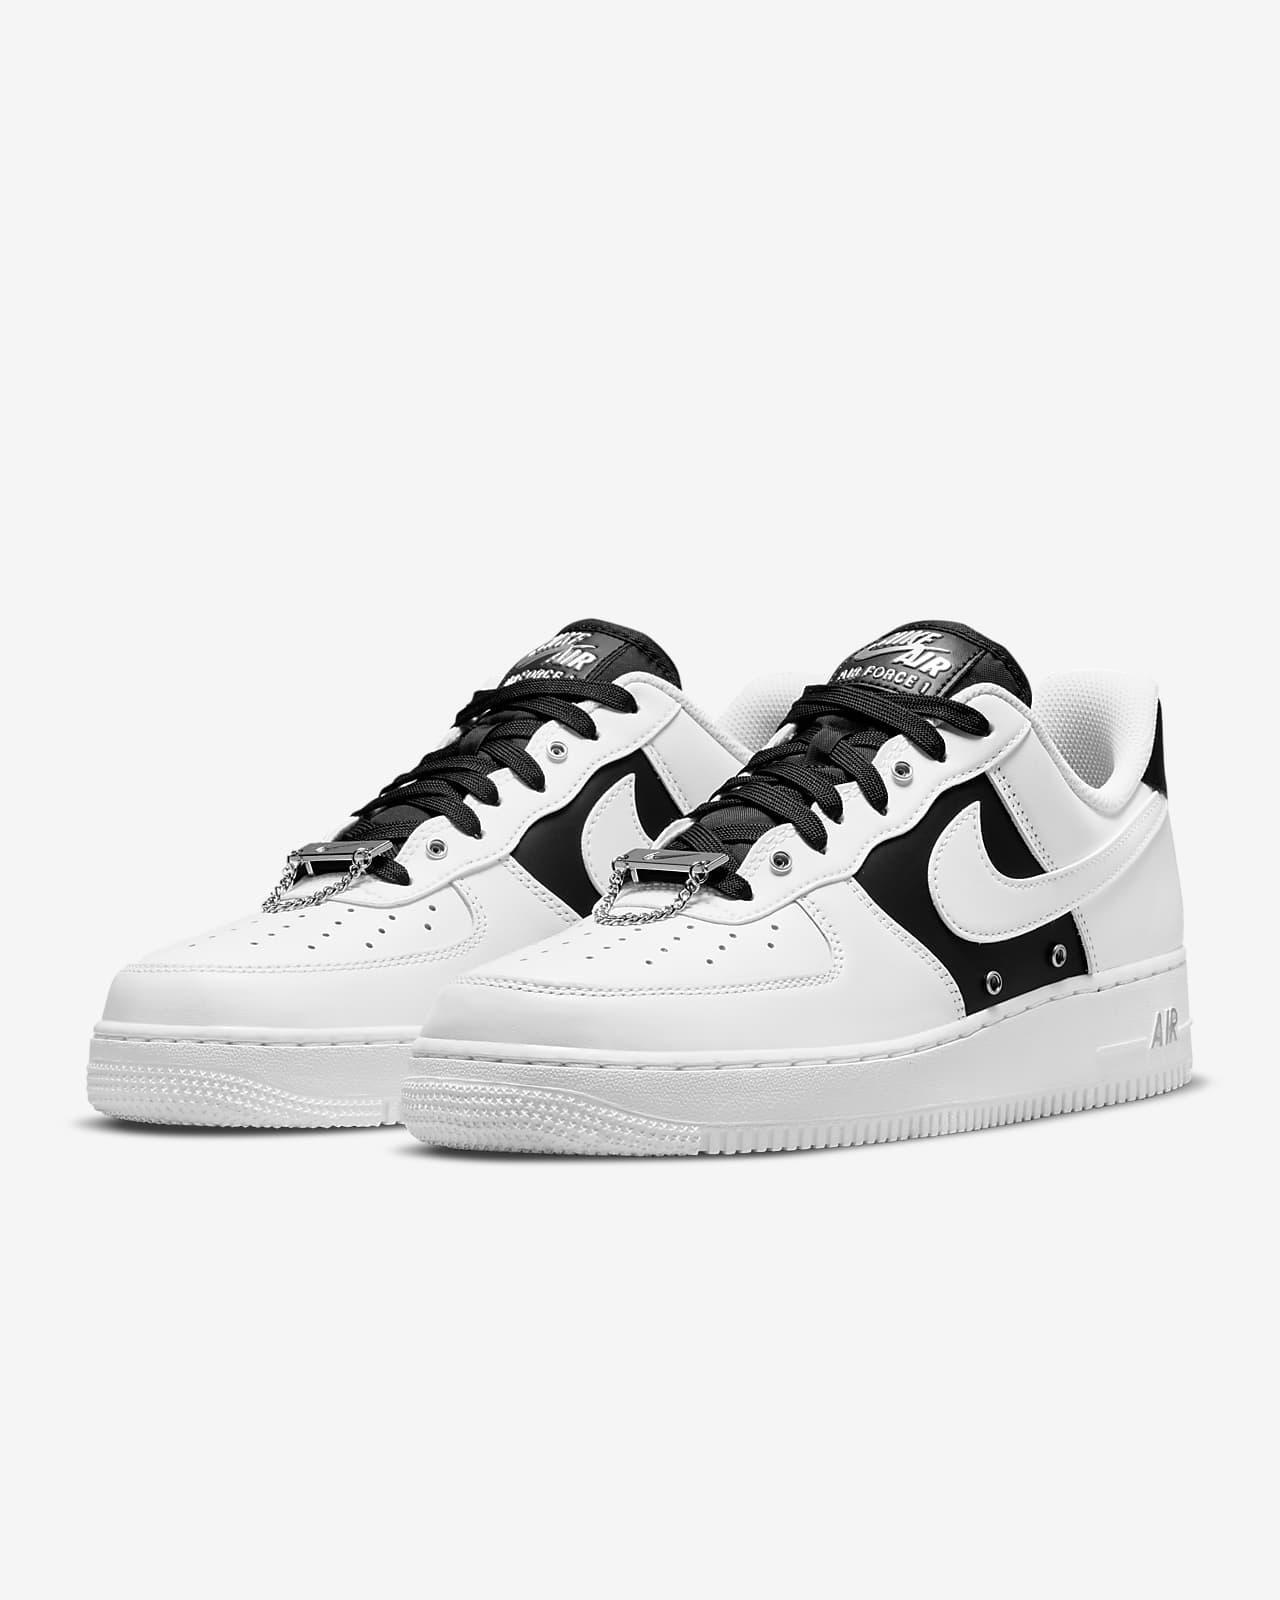 Nike Air Force 1 '07 PRM Men's Shoe. Nike ID